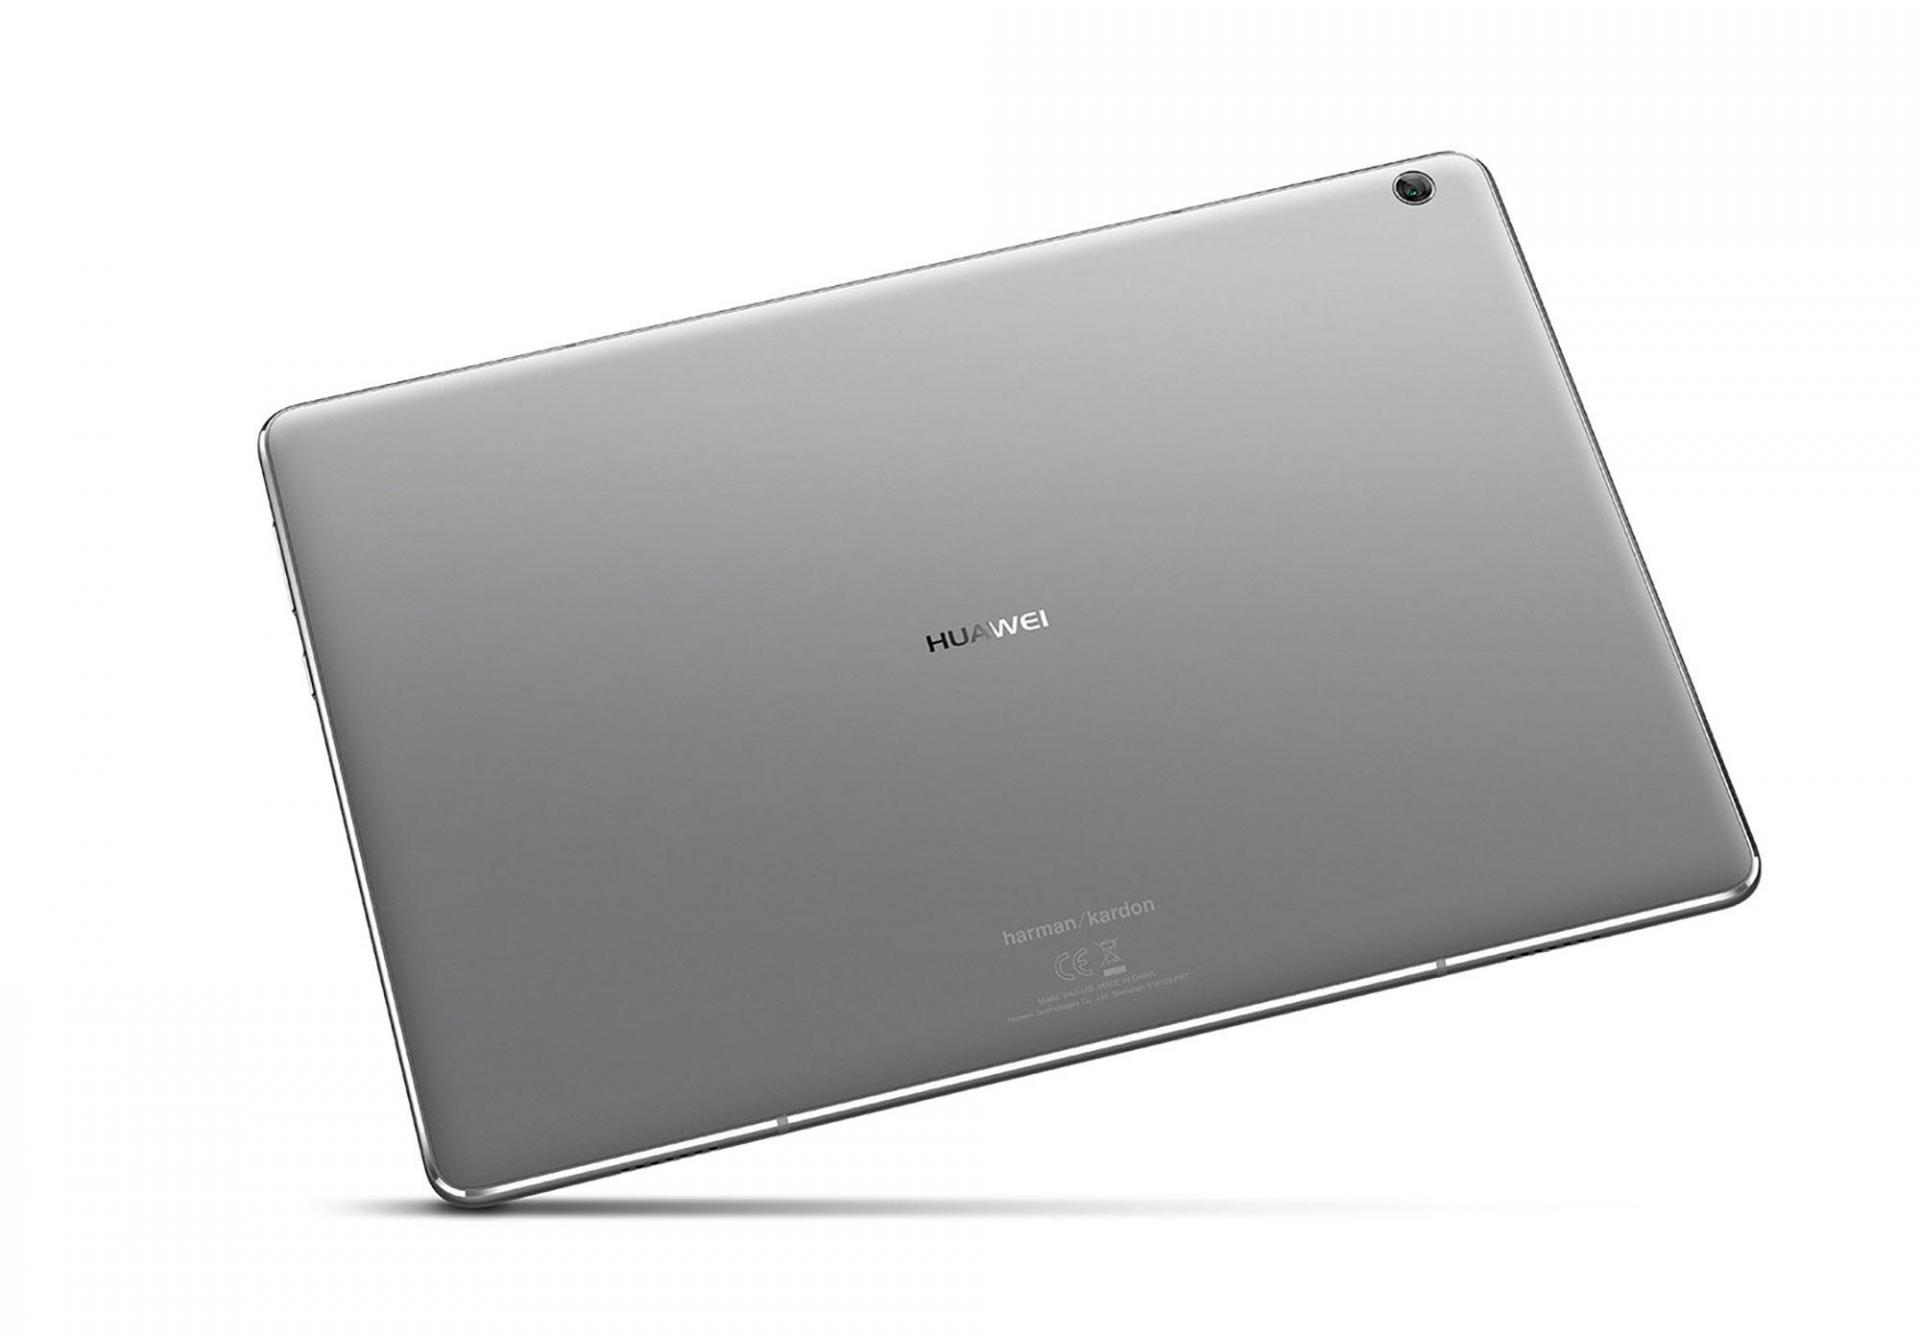 Huawei MediaPad M3 Lite 10 поступает в продажу